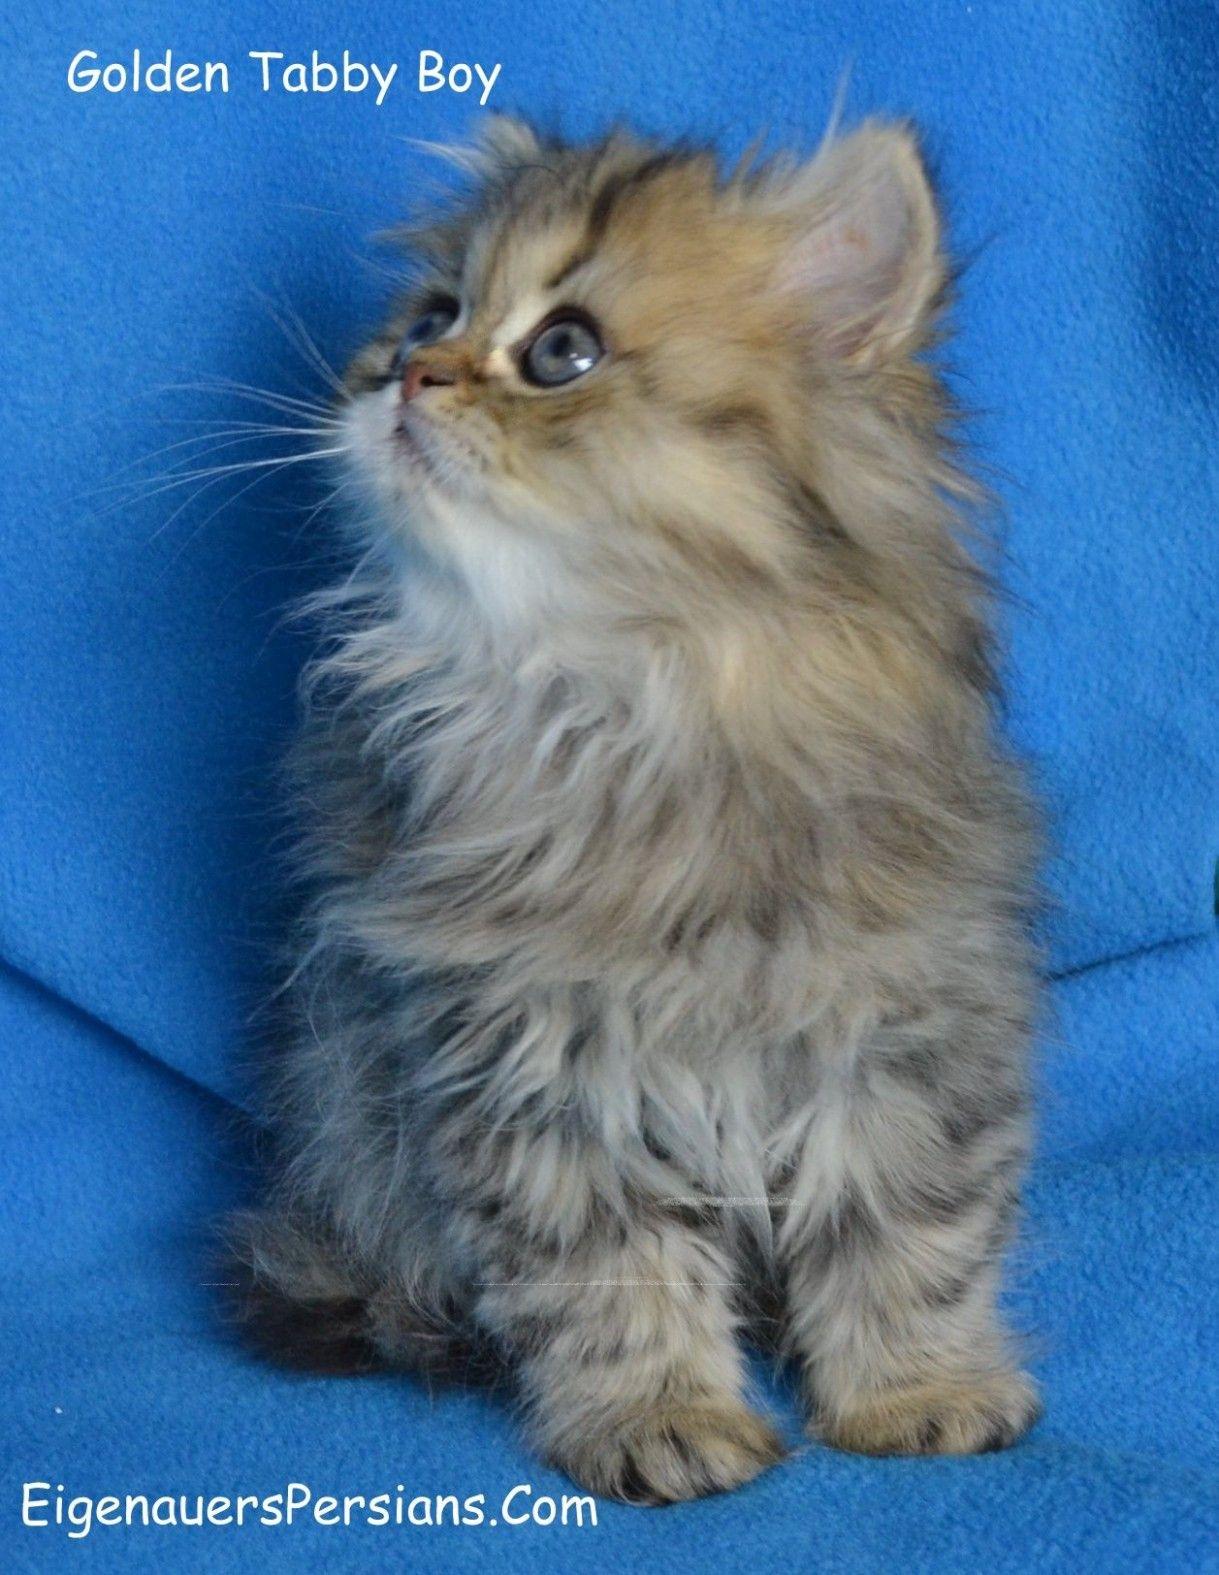 9 Cute Doll Face Kittens For Sale Near Me Image In 2020 Persian Kittens Persian Kittens For Sale Teacup Kitten